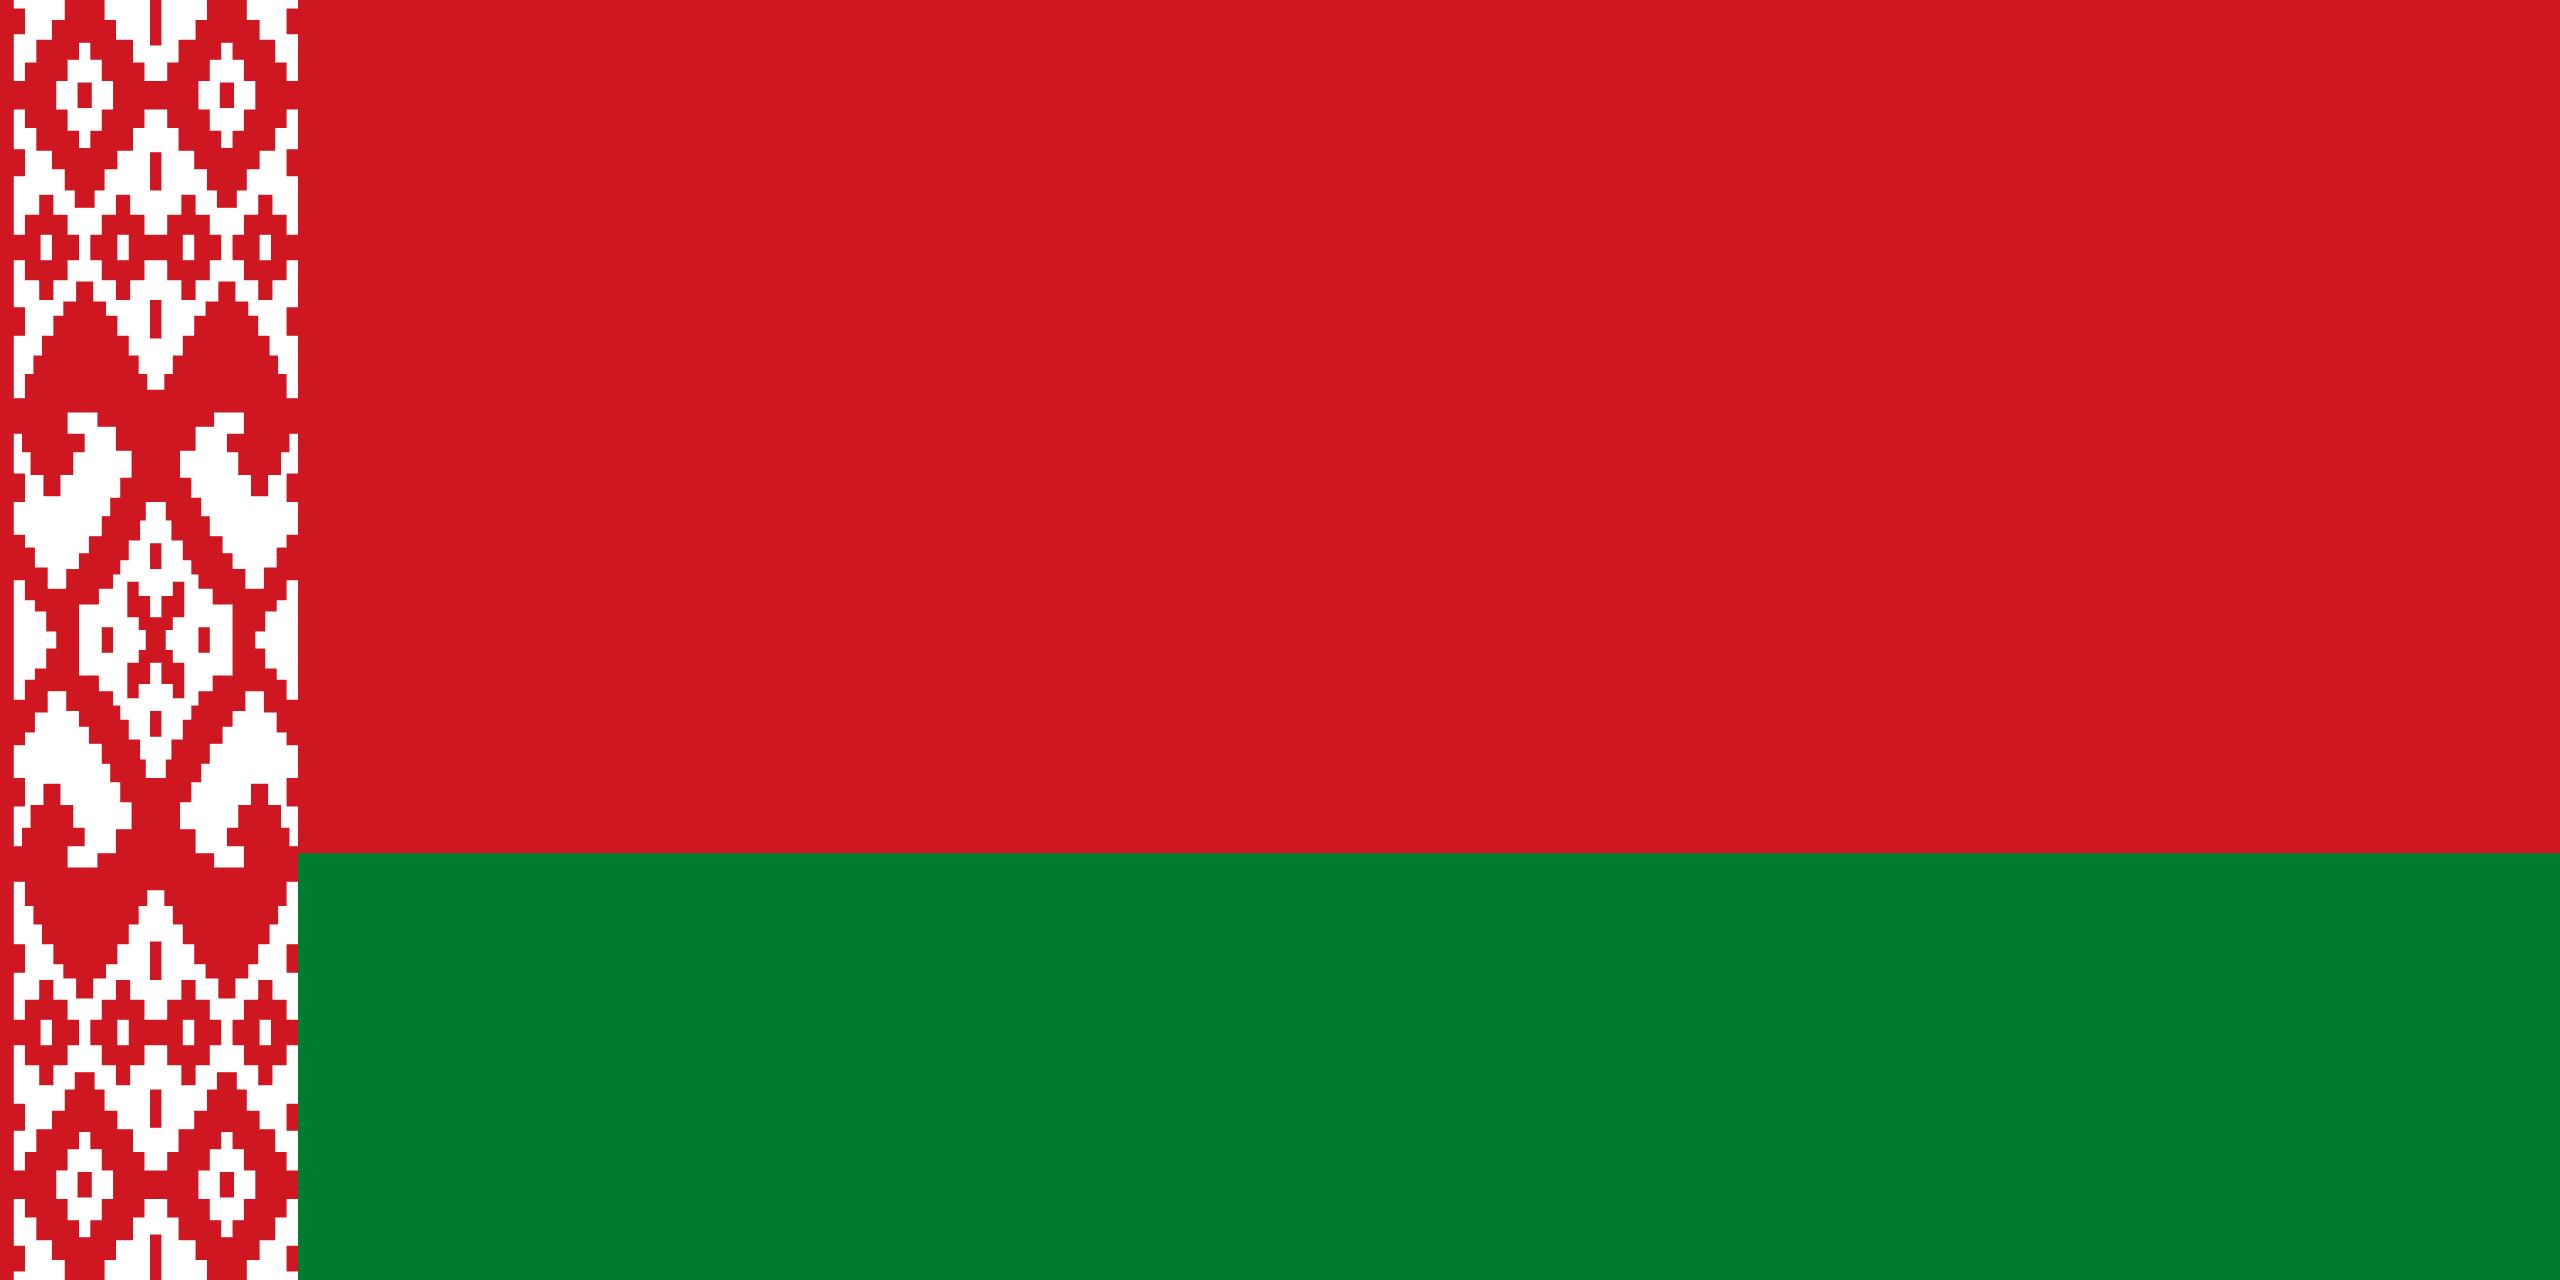 http://castillospalacios.blogspot.com.es/2014/08/castillos-de-bielorrusia.html